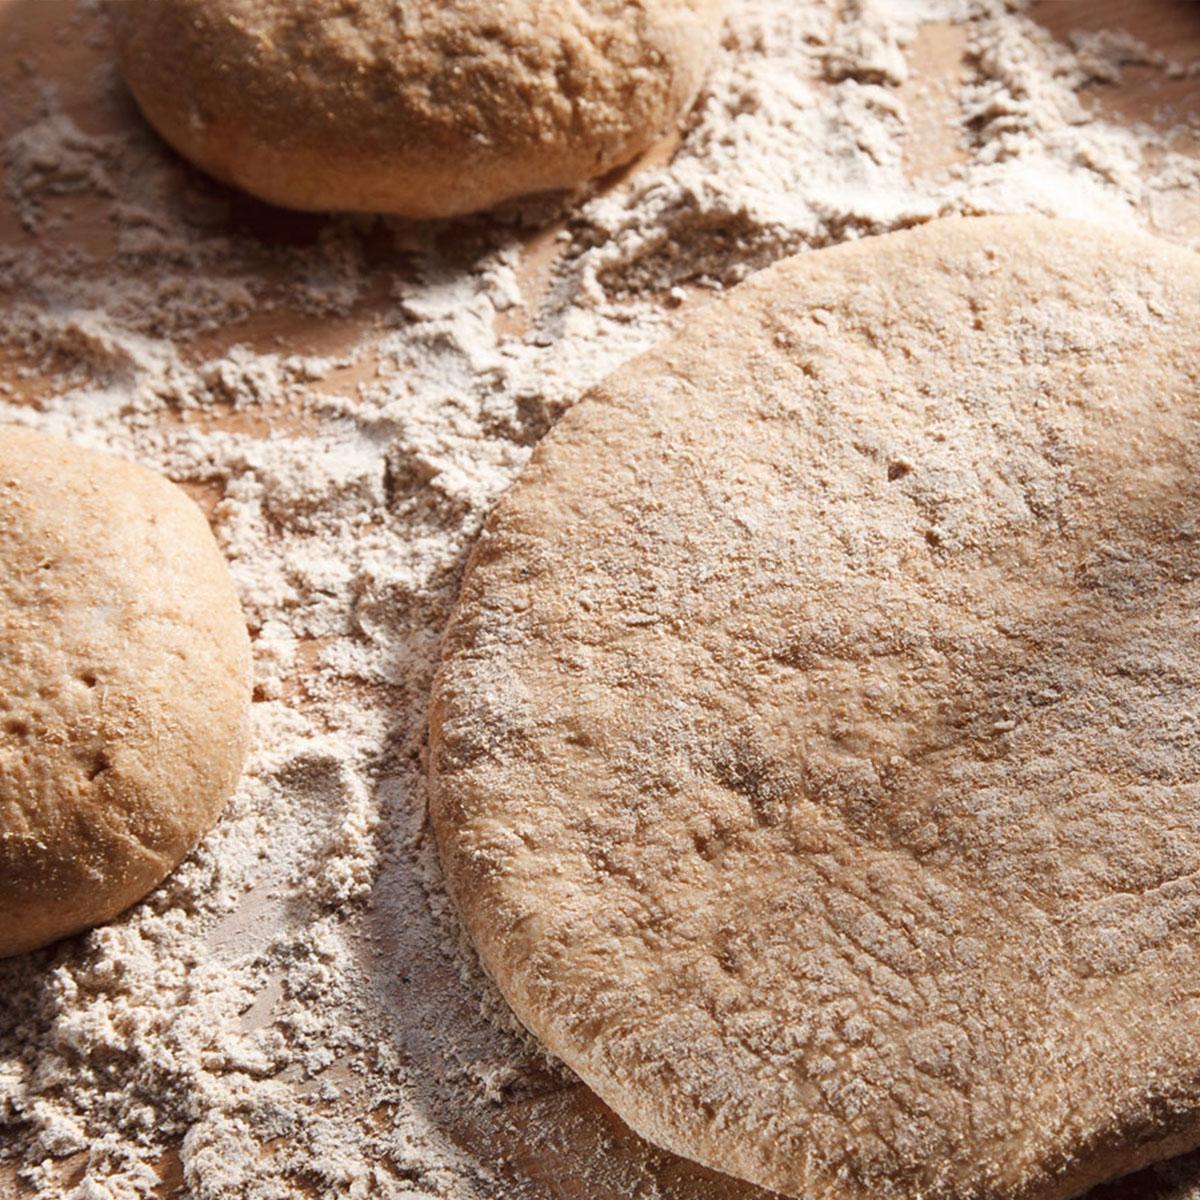 conventional flour